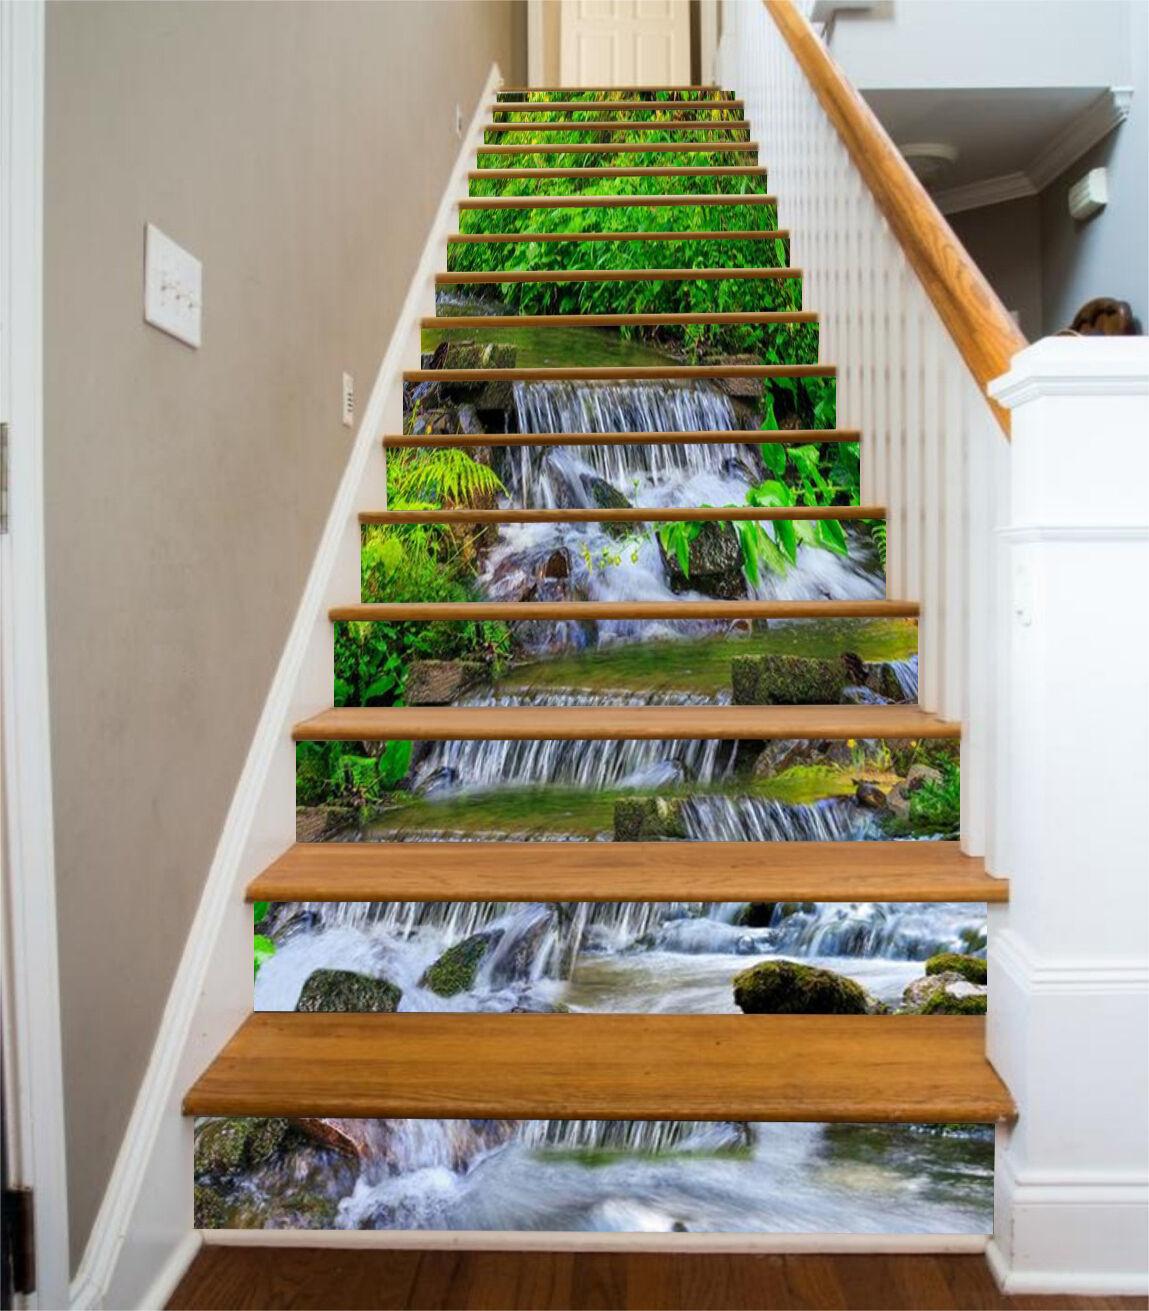 3D Frisch Natur 839 Stair Risers Dekoration Fototapete Vinyl Aufkleber Tapete DE